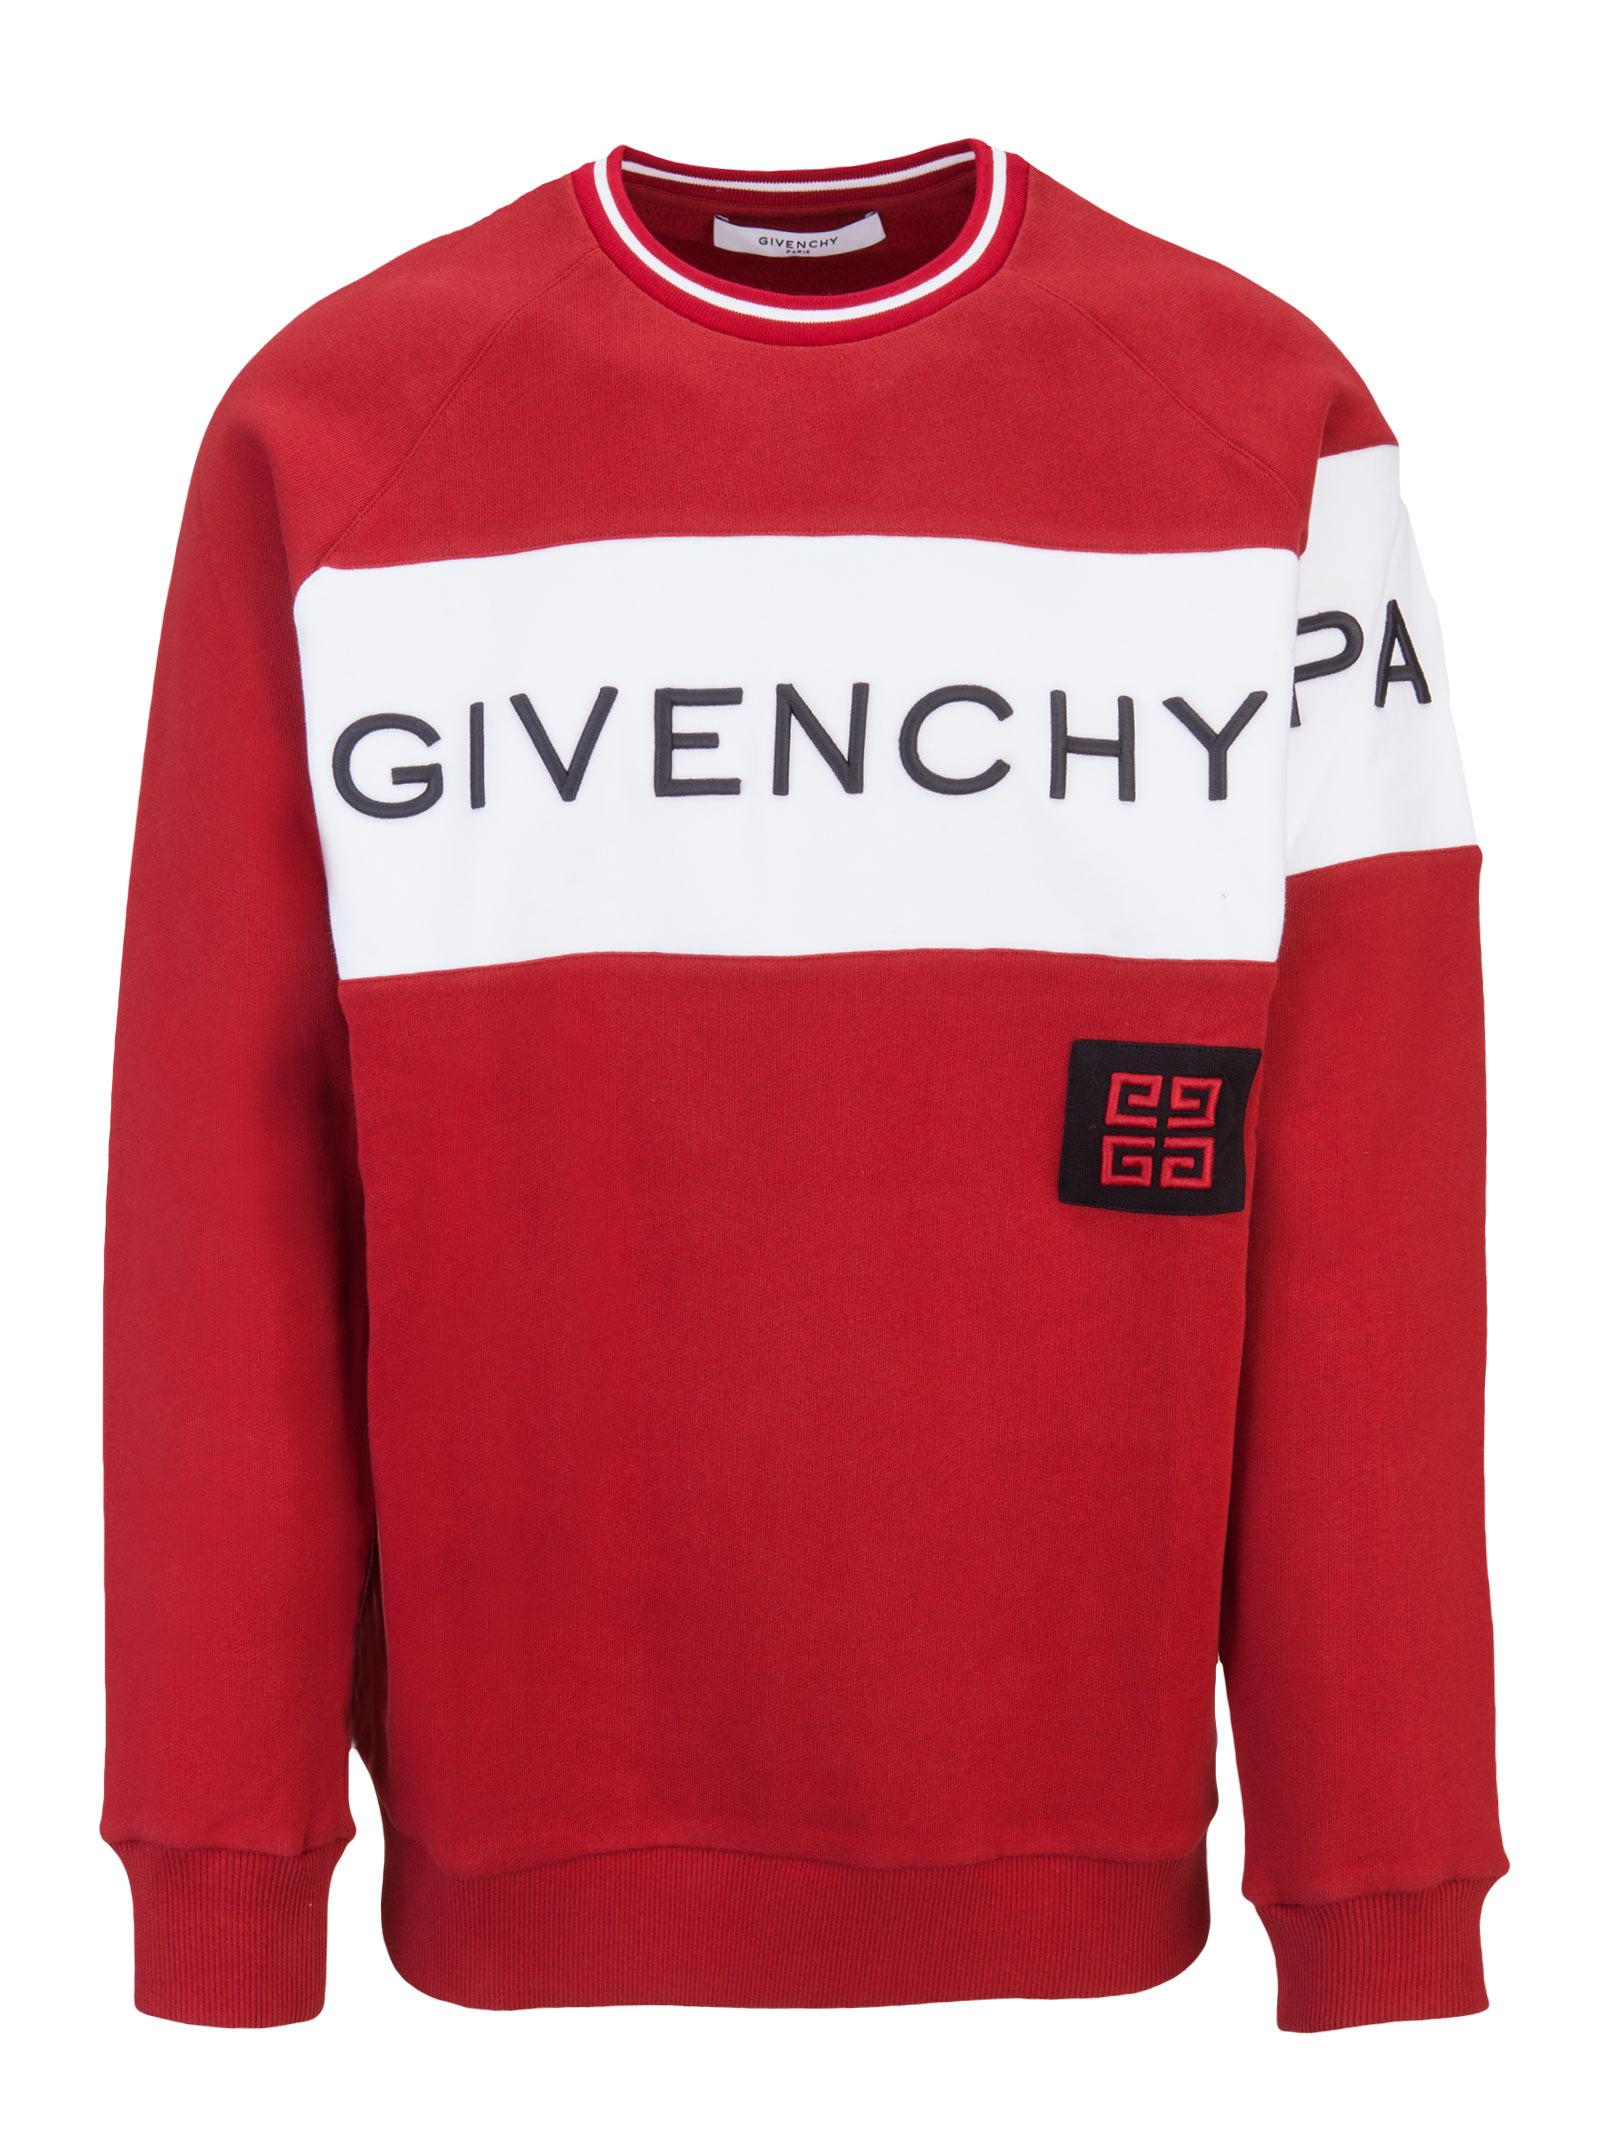 Givenchy sweatshirt